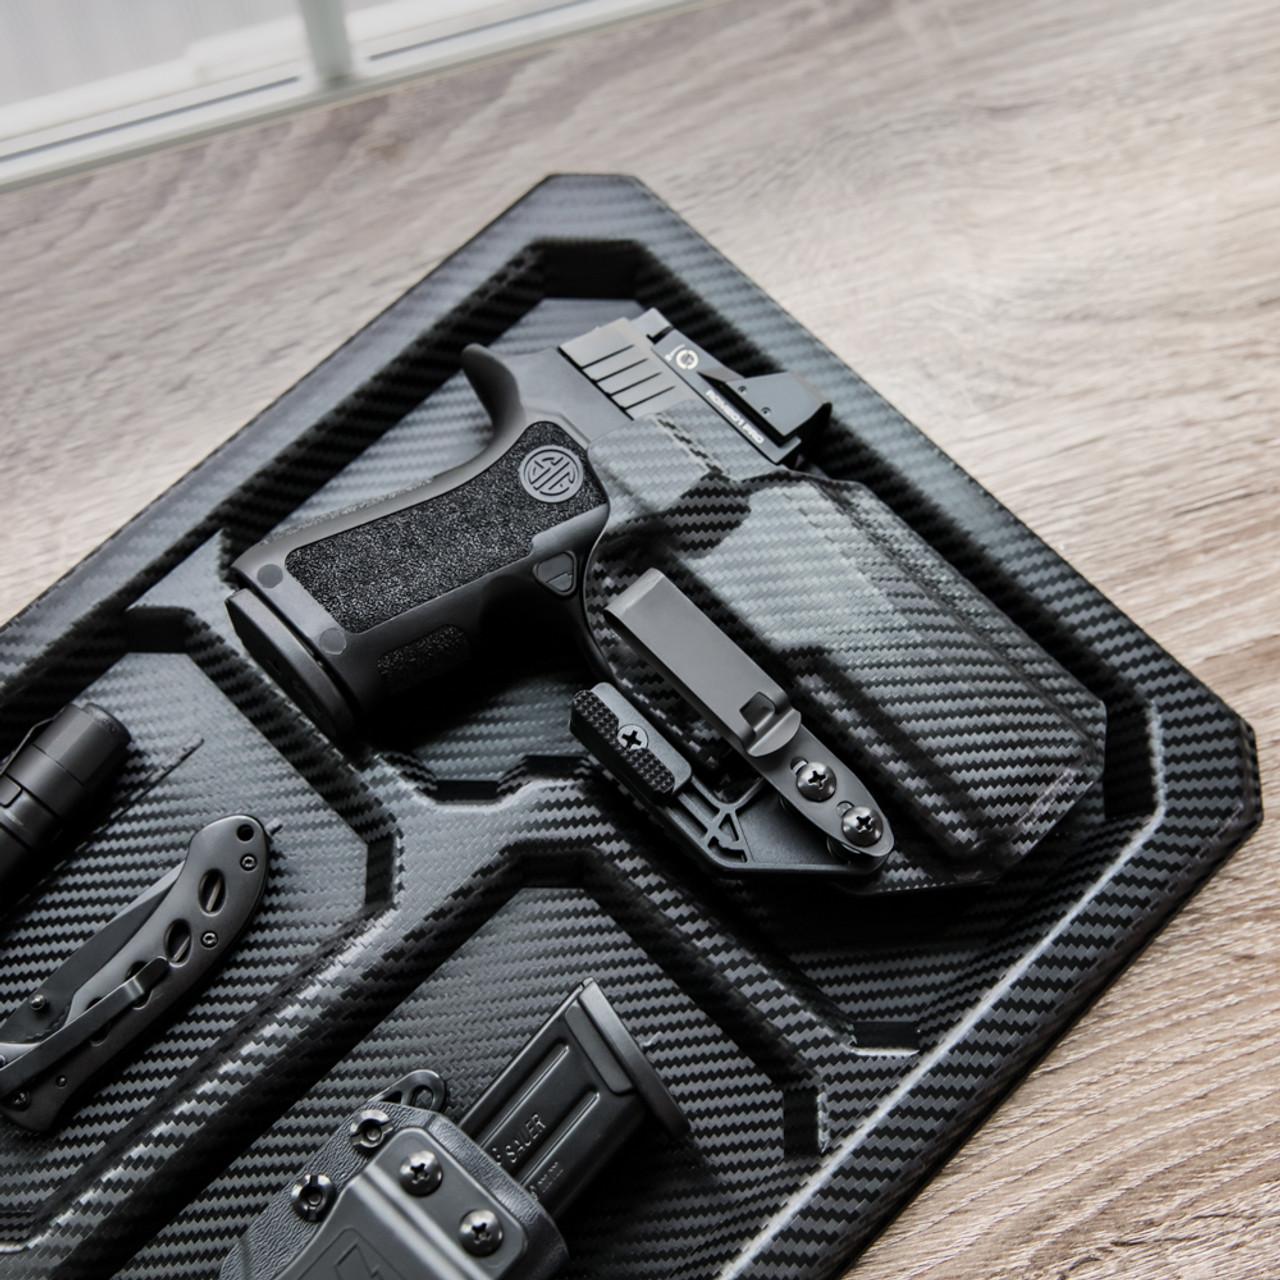 Glock 19/19X/23/25/32/44/45 - OATH IWB Holster